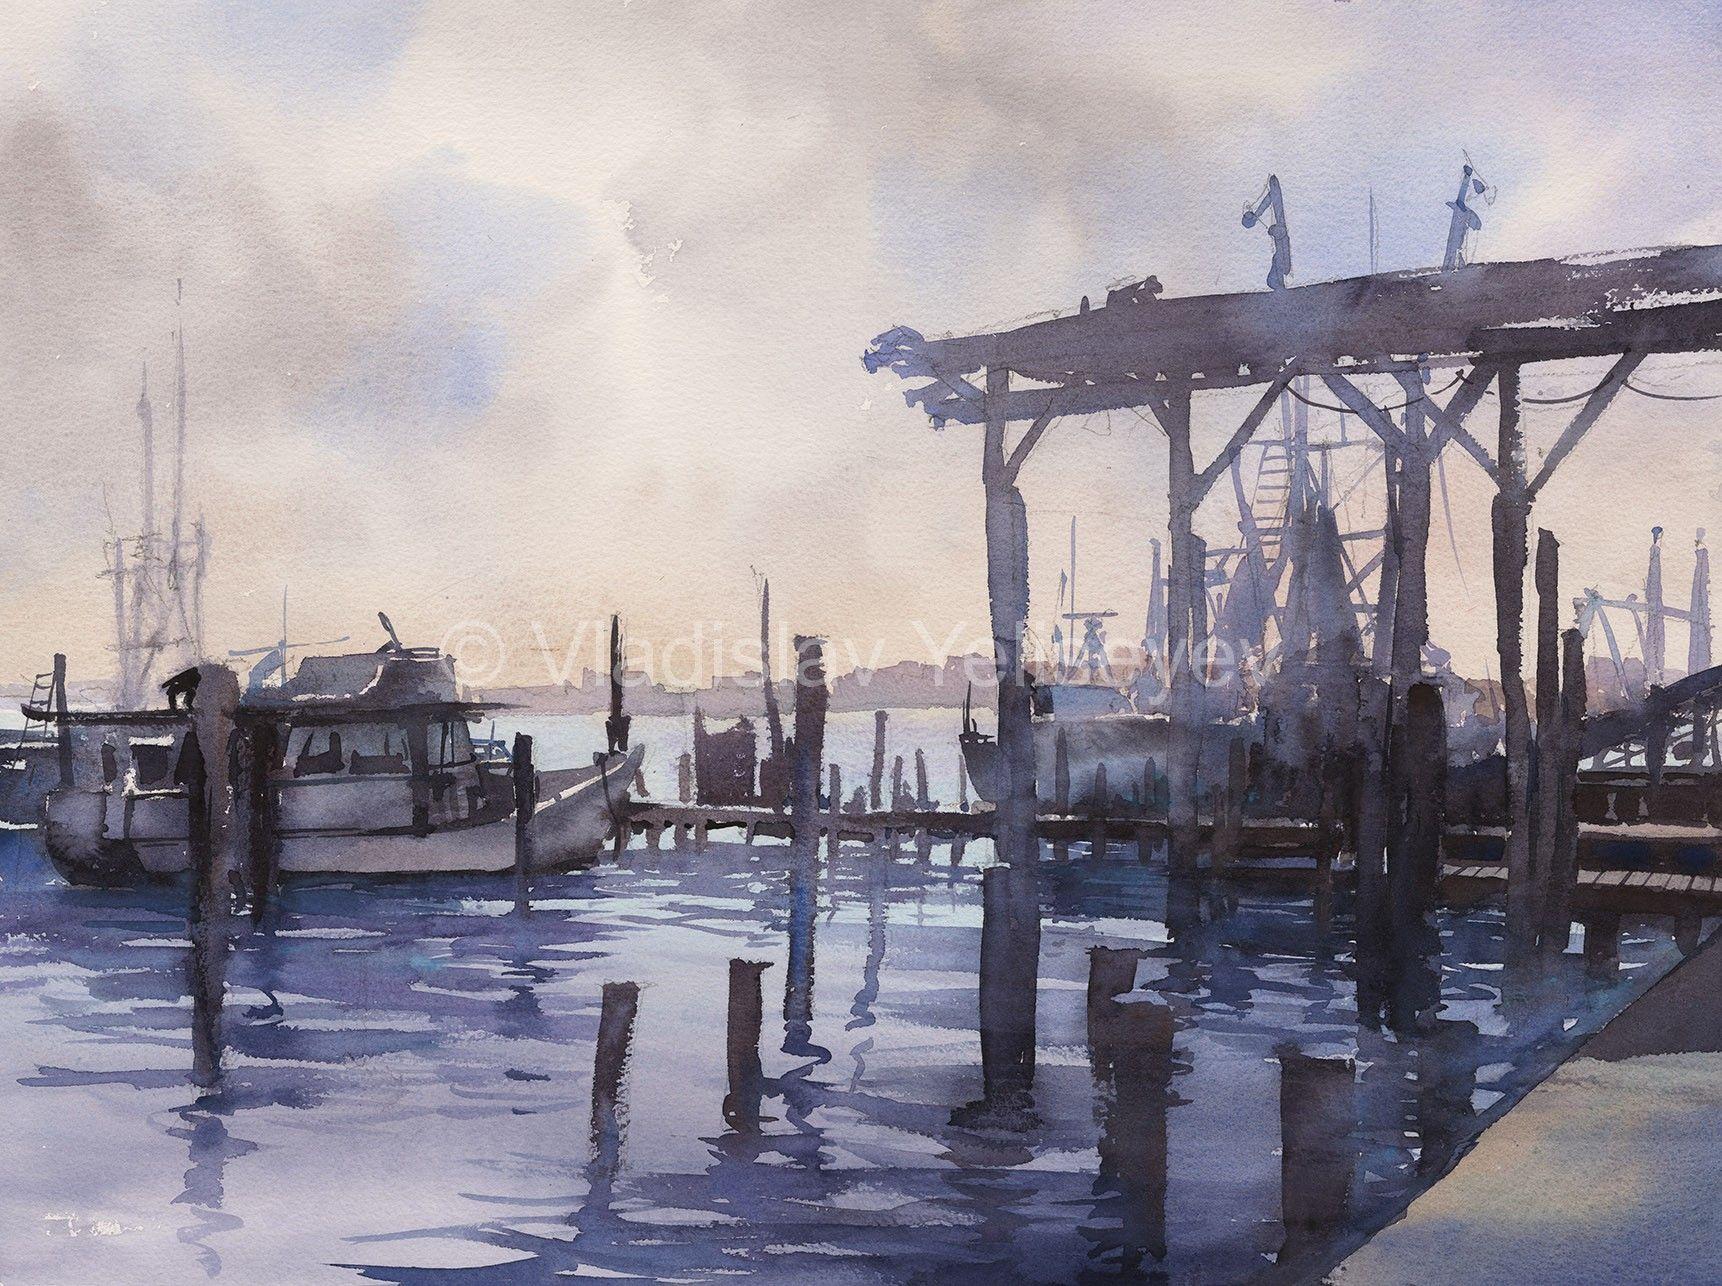 Watercolor artist magazine palm coast fl - Urban Paintings Watercolor Artworks By Artist Vladislav Yeliseyev